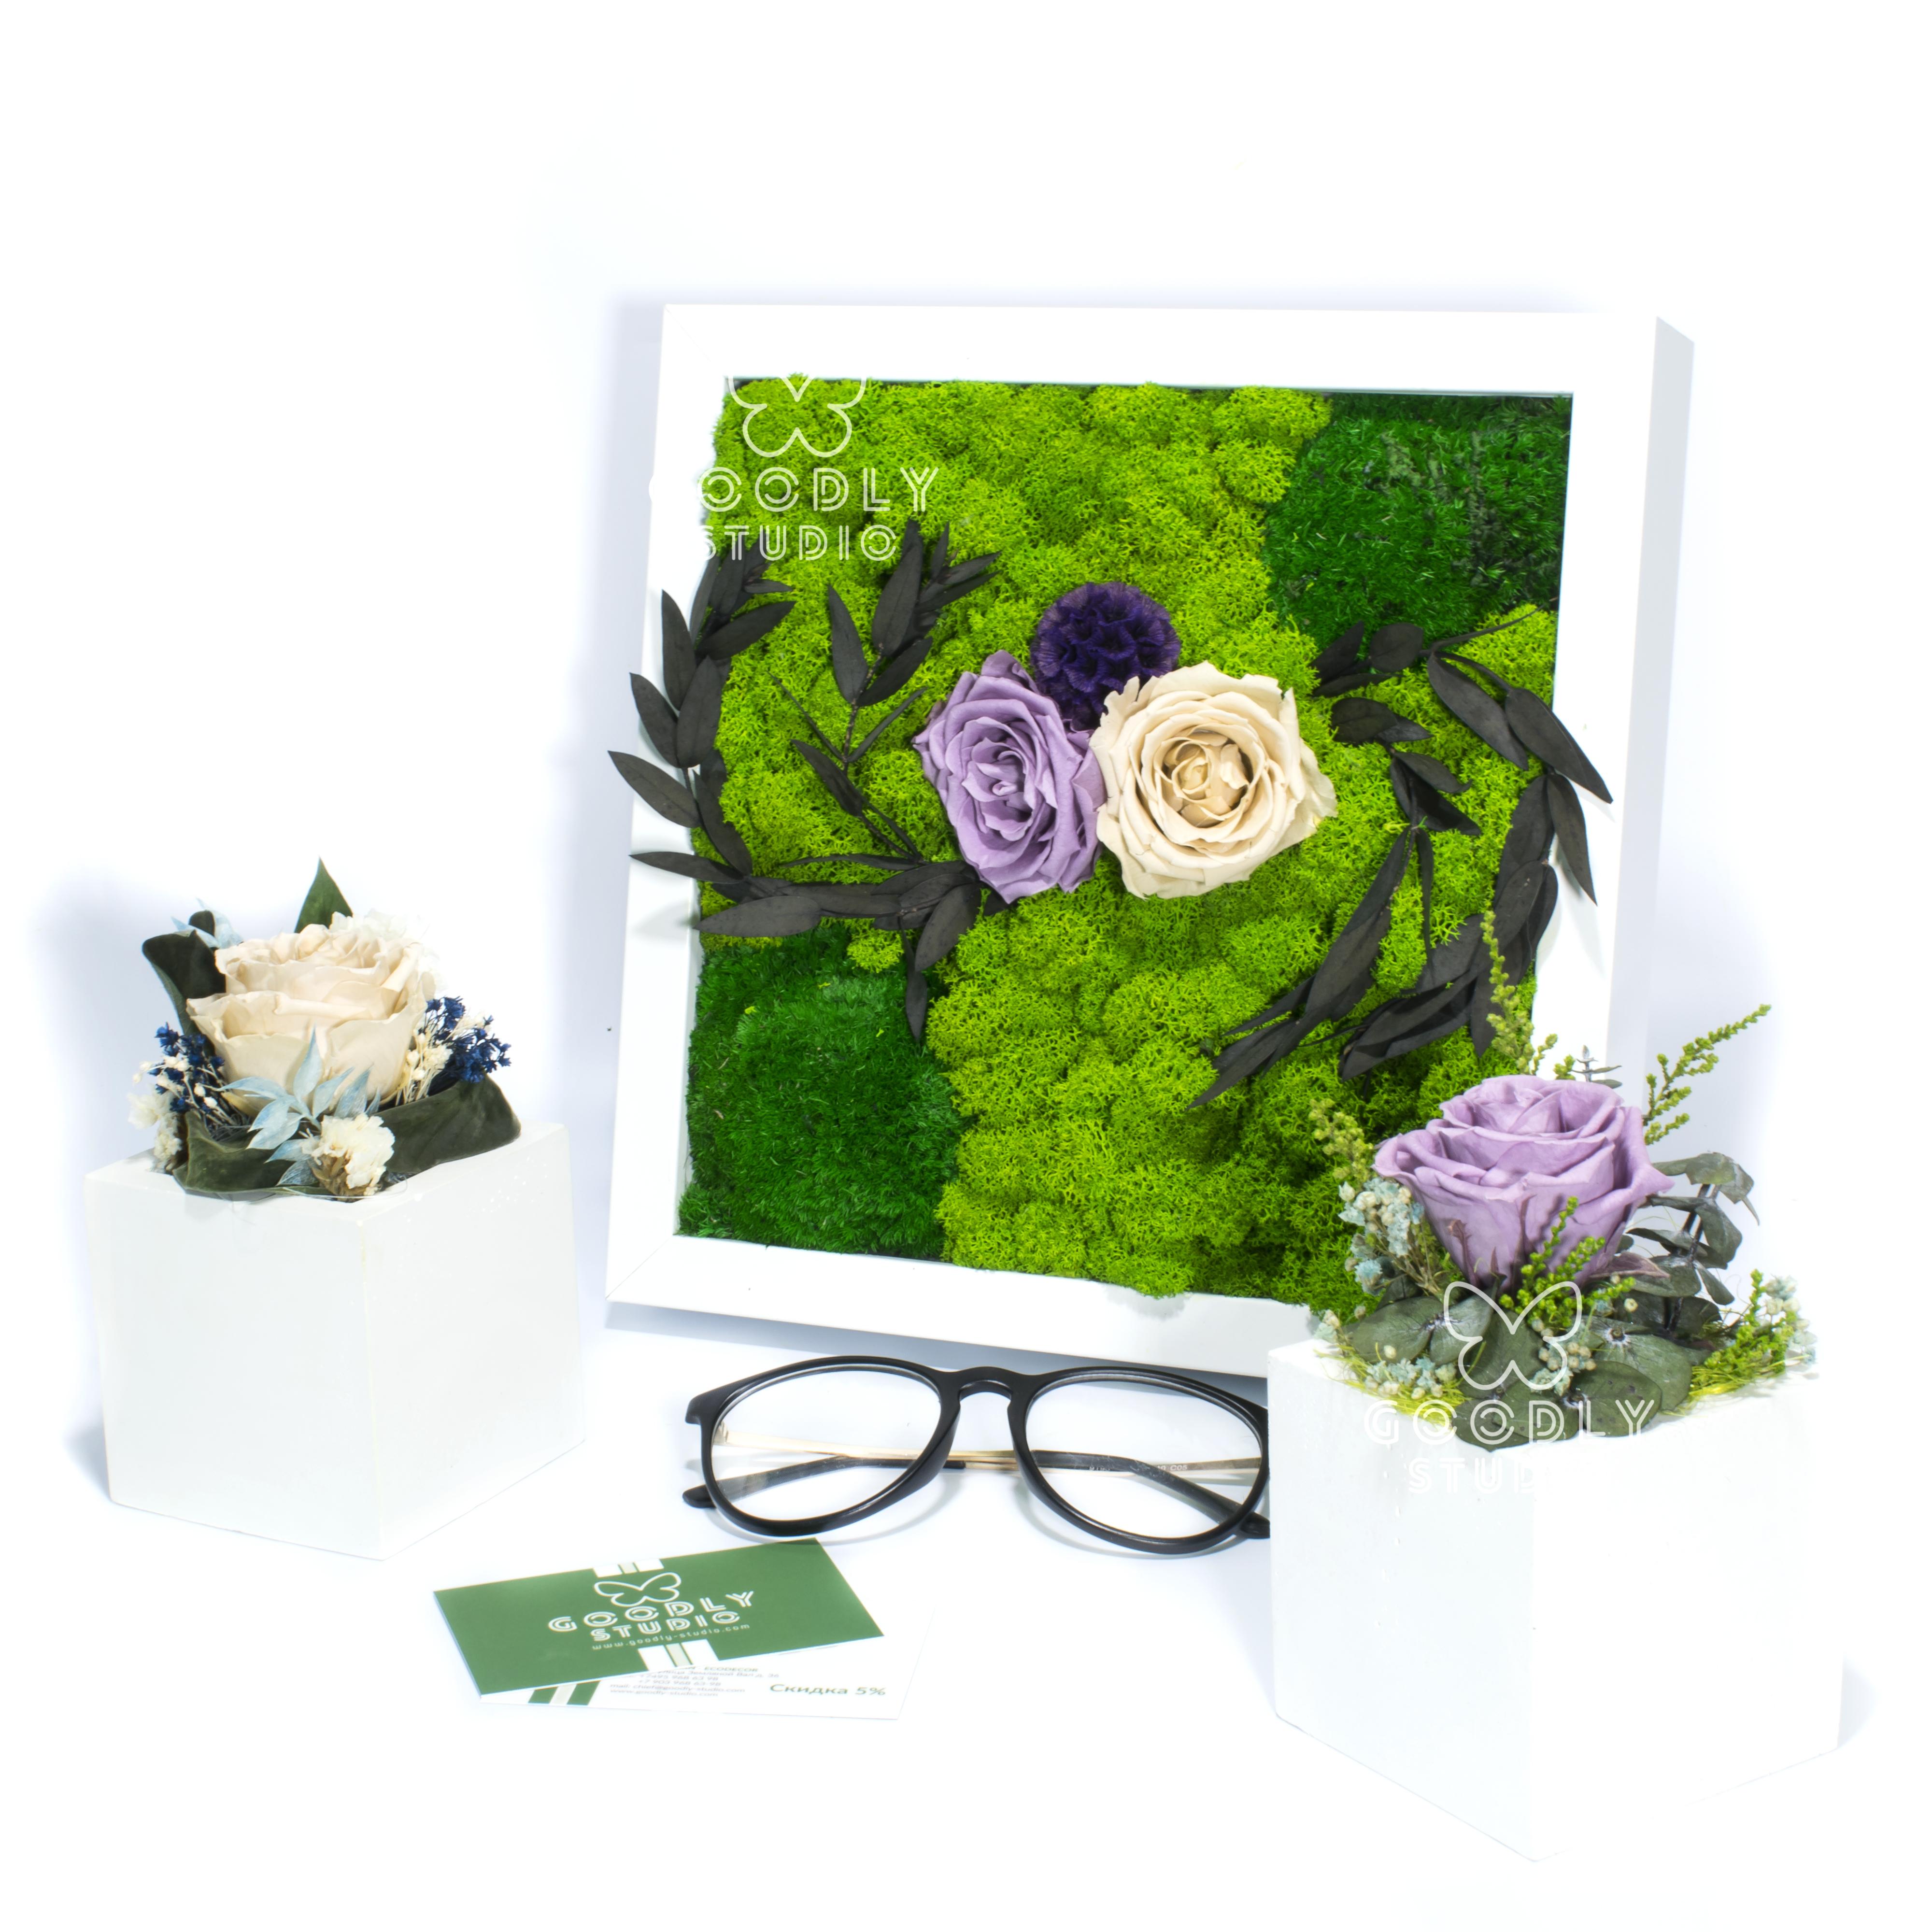 Картина и кашпо с цветами -15%